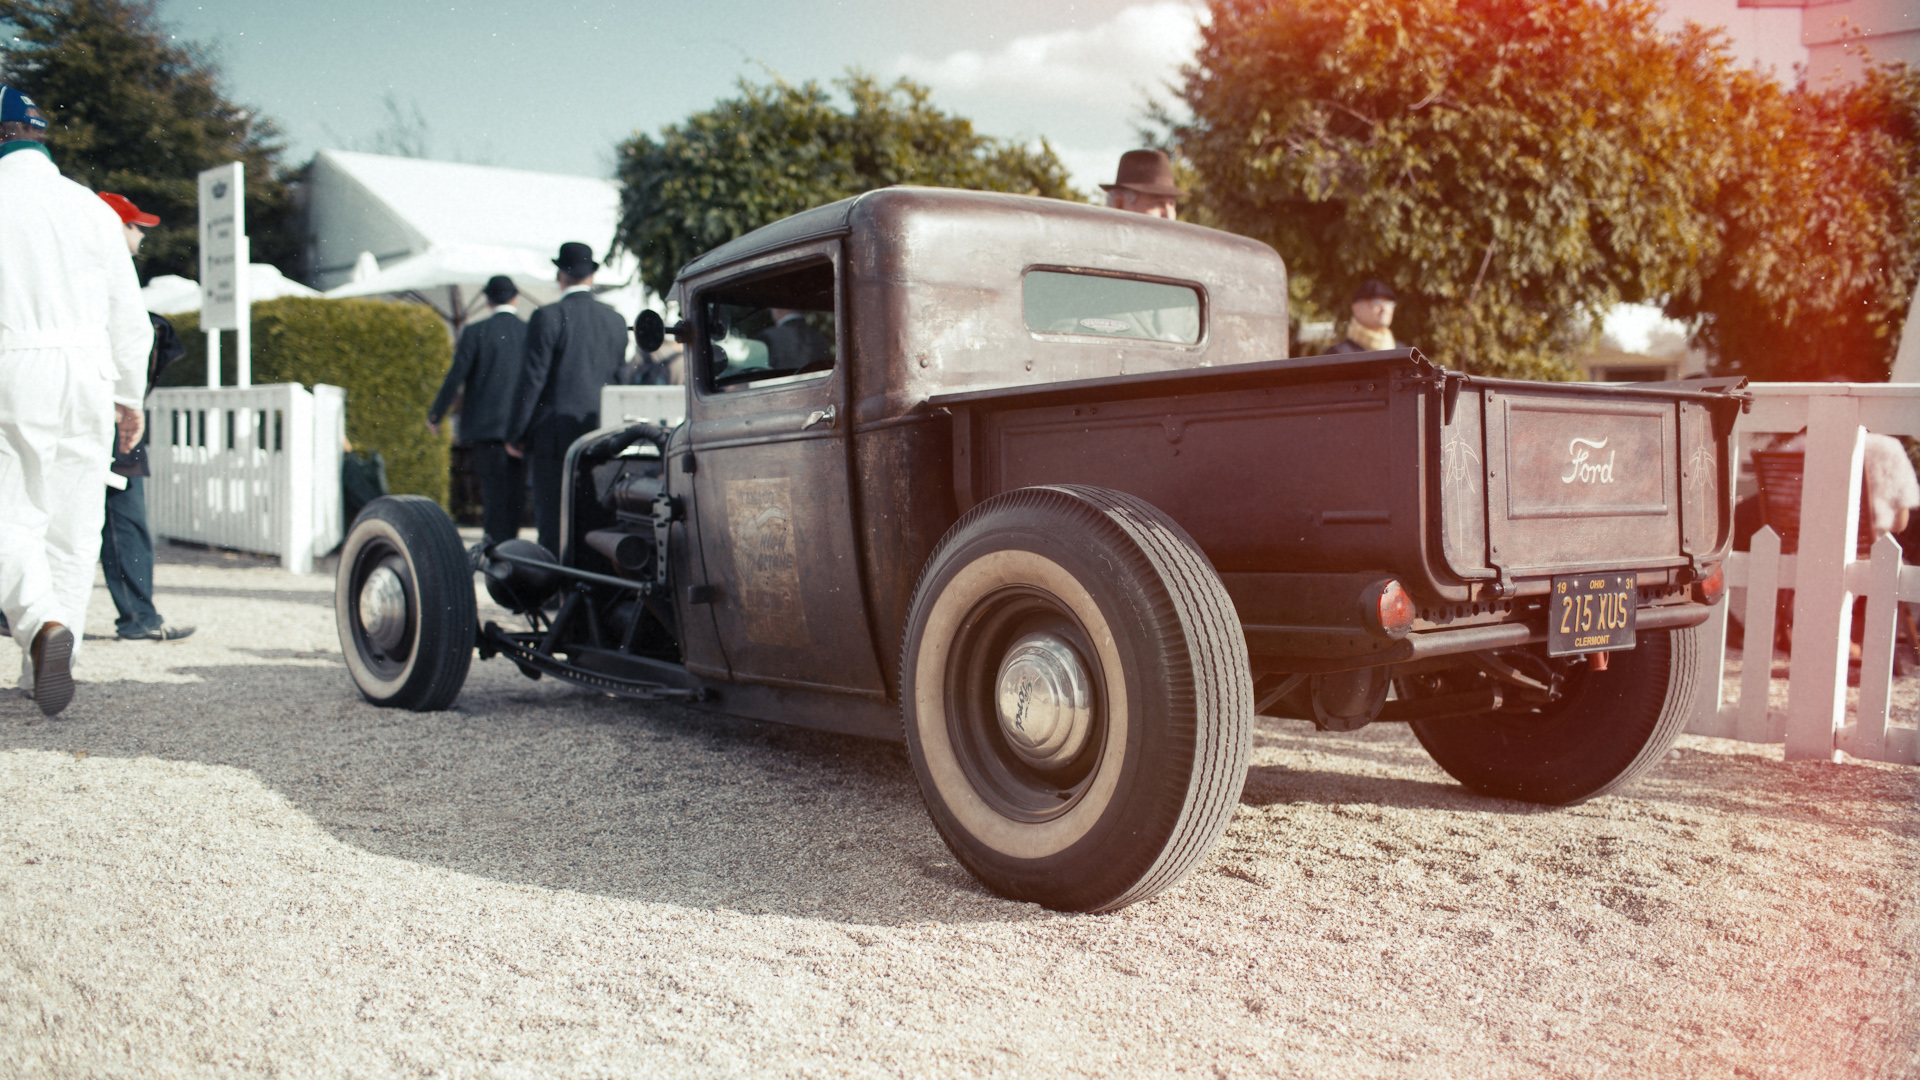 Classic Ford Hot Rod Wallpaper | HD Car